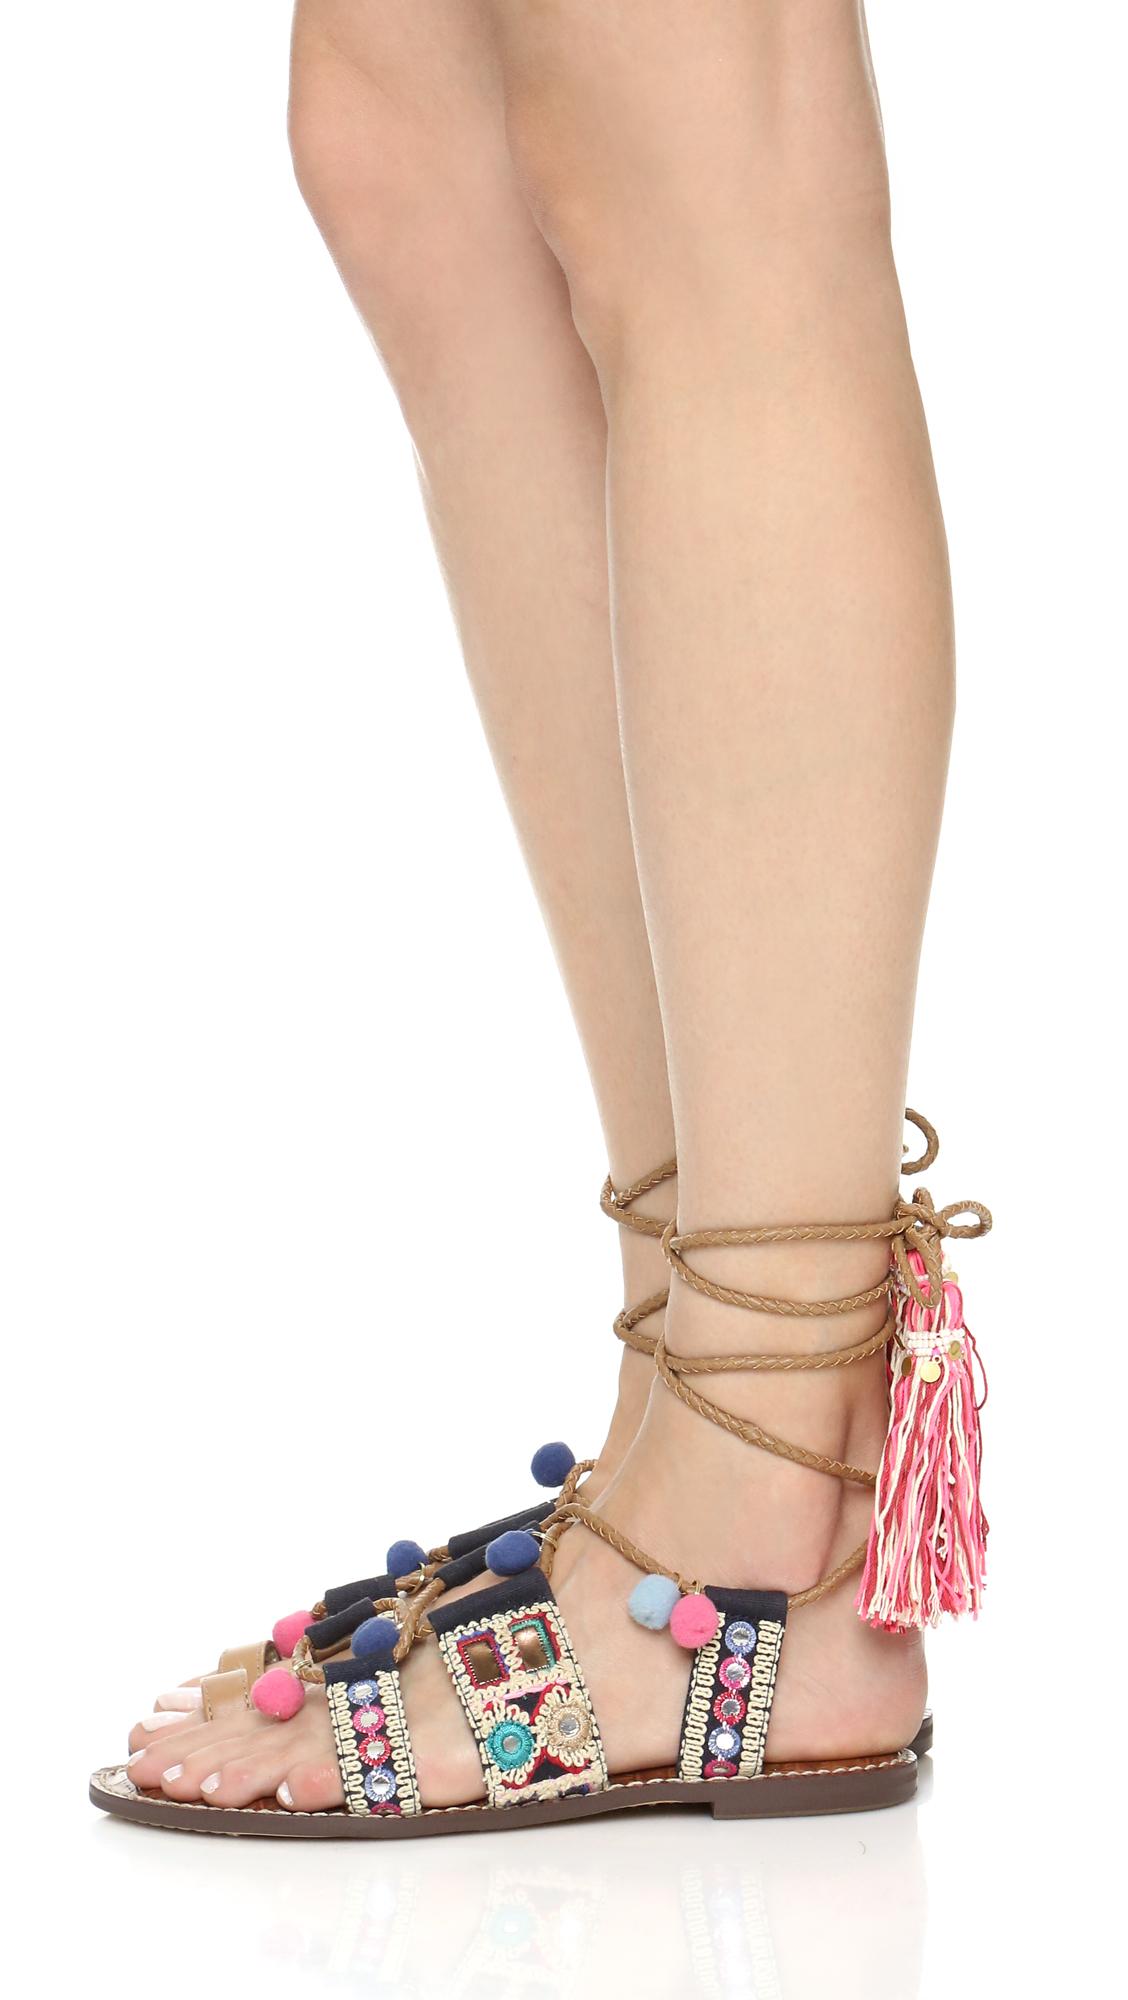 771396a8e85 Sam Edelman Gretchen Flat Sandals